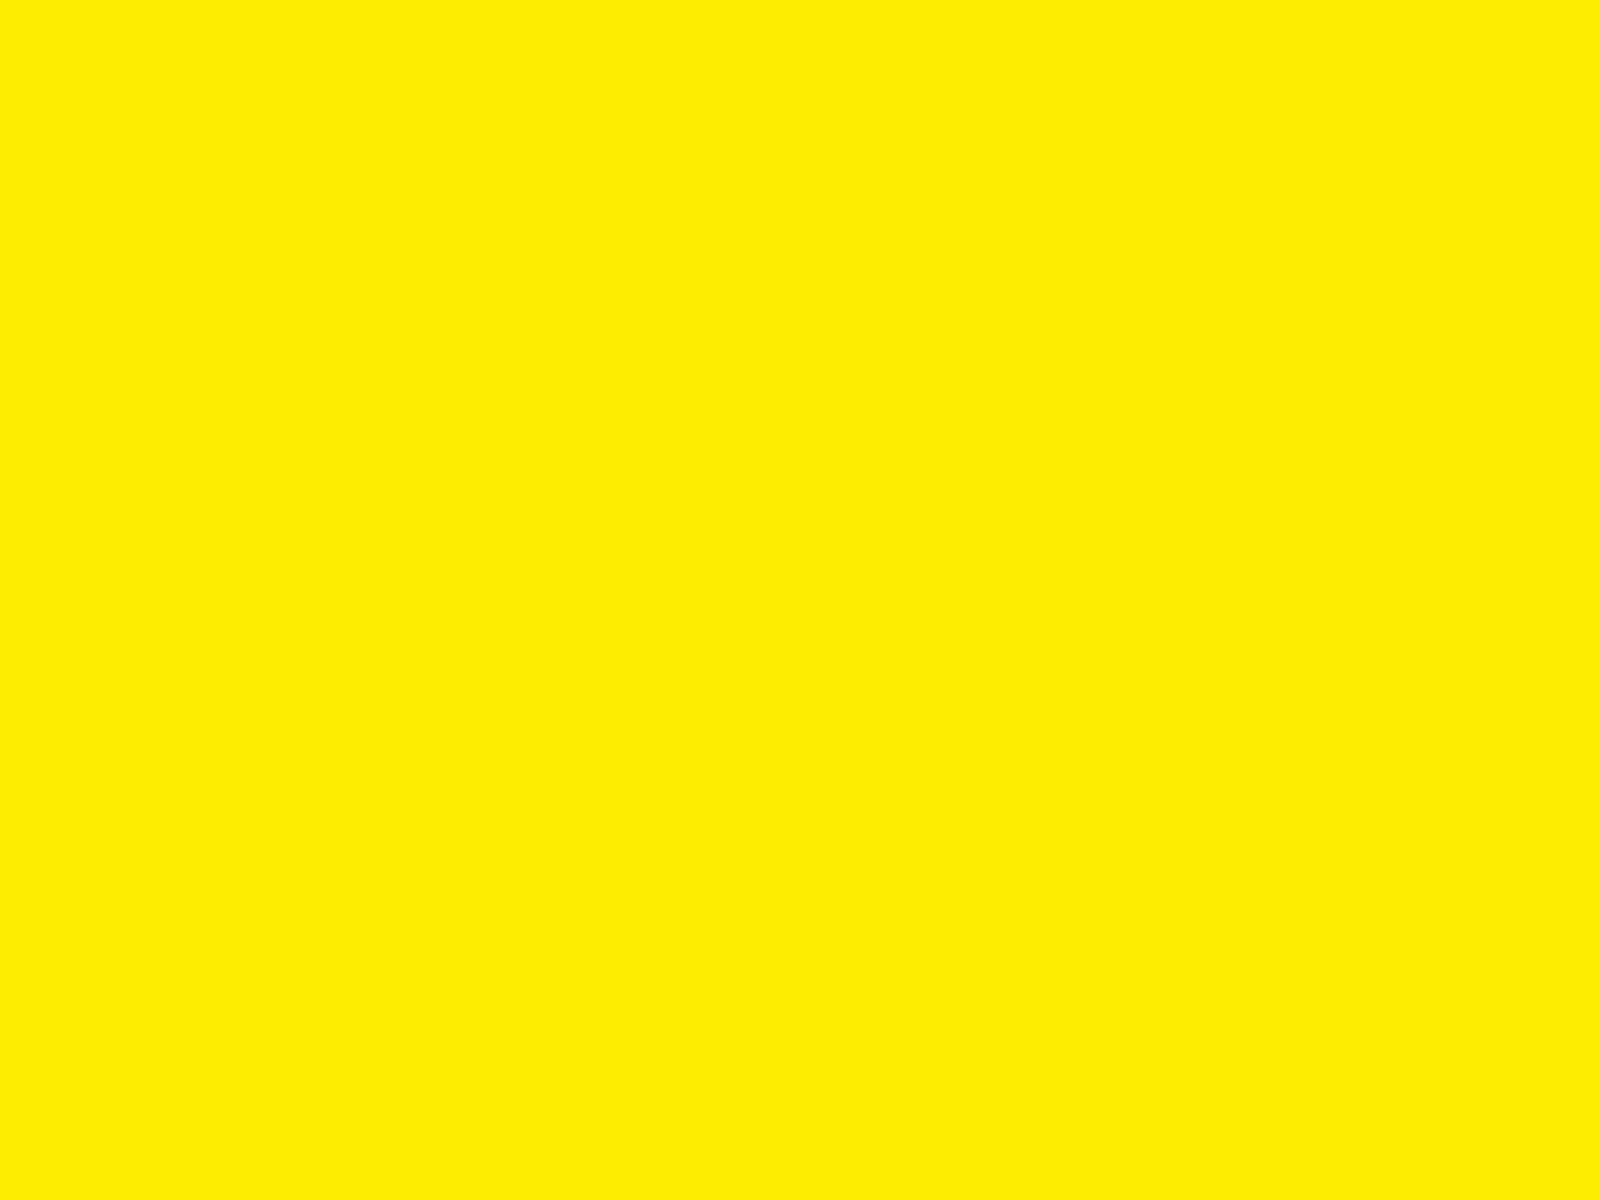 1600x1200 Aureolin Solid Color Background